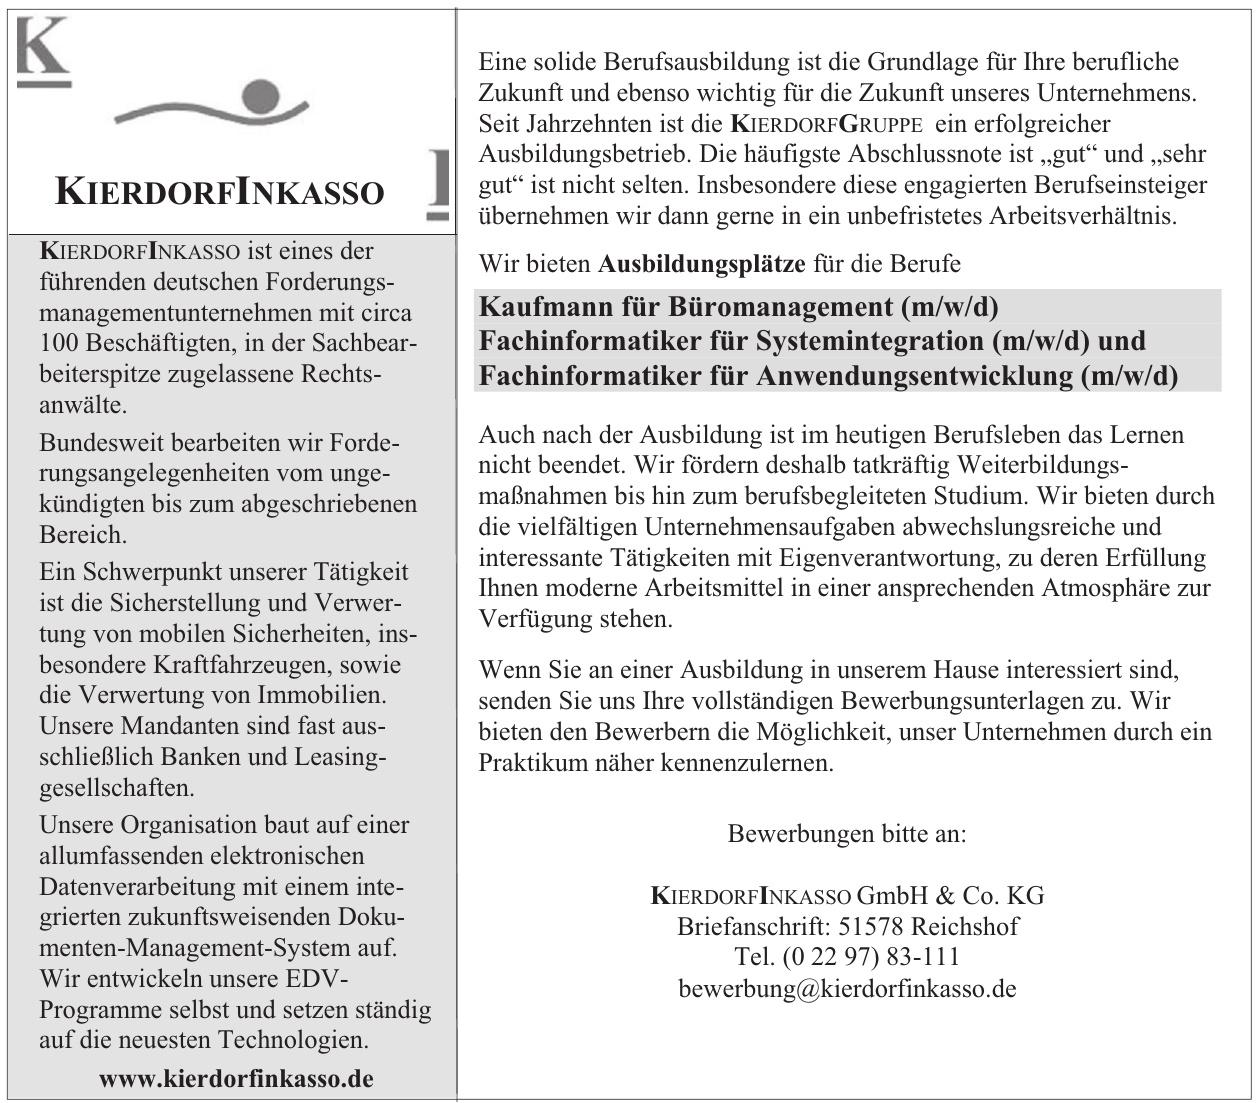 KierdorfinKasso GmbH & Co. KG